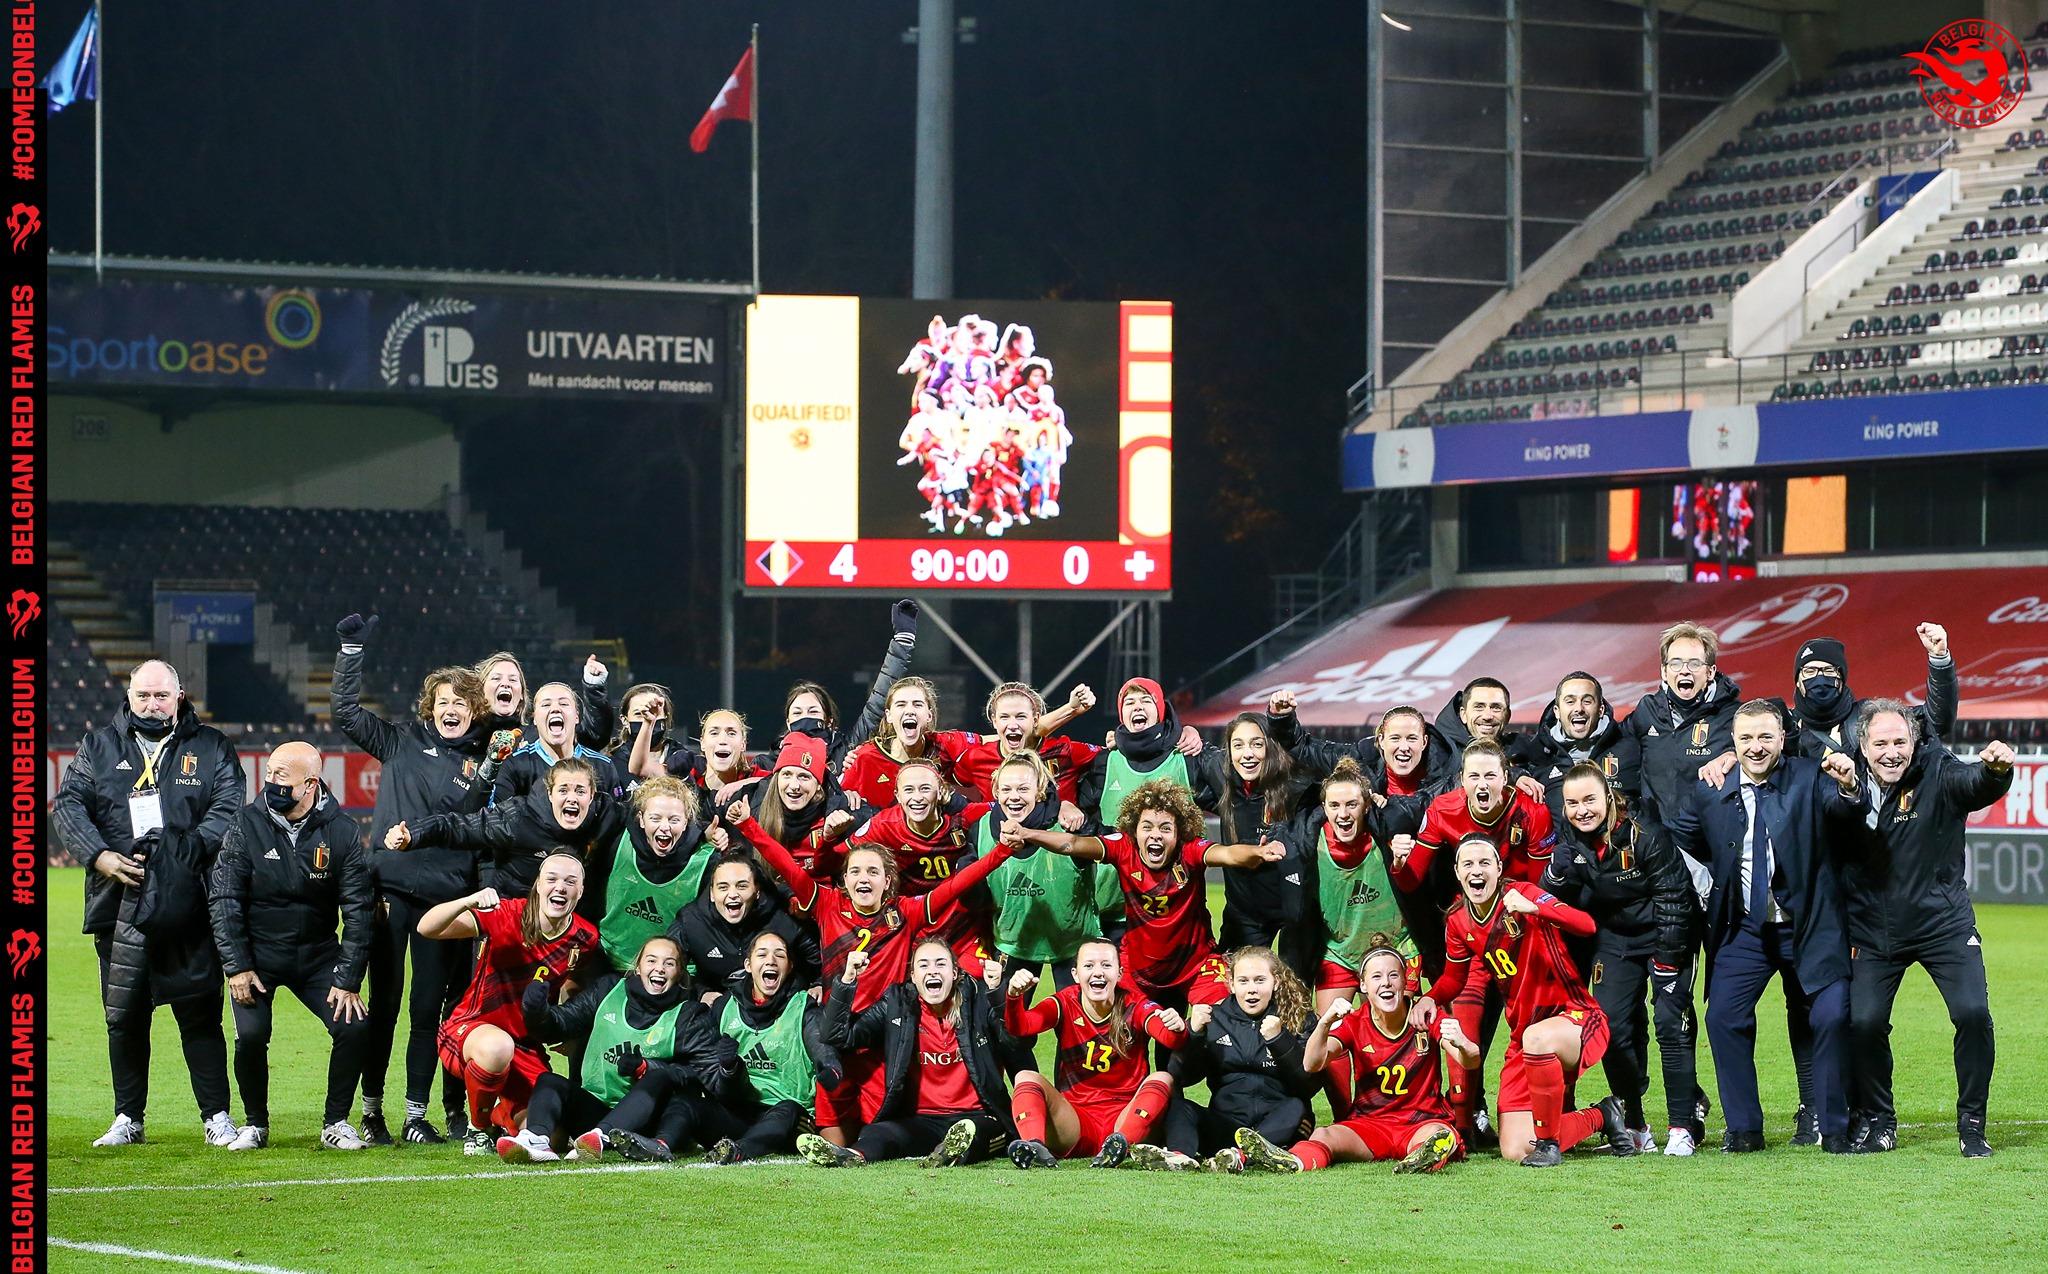 (C) Belgian Red Flames